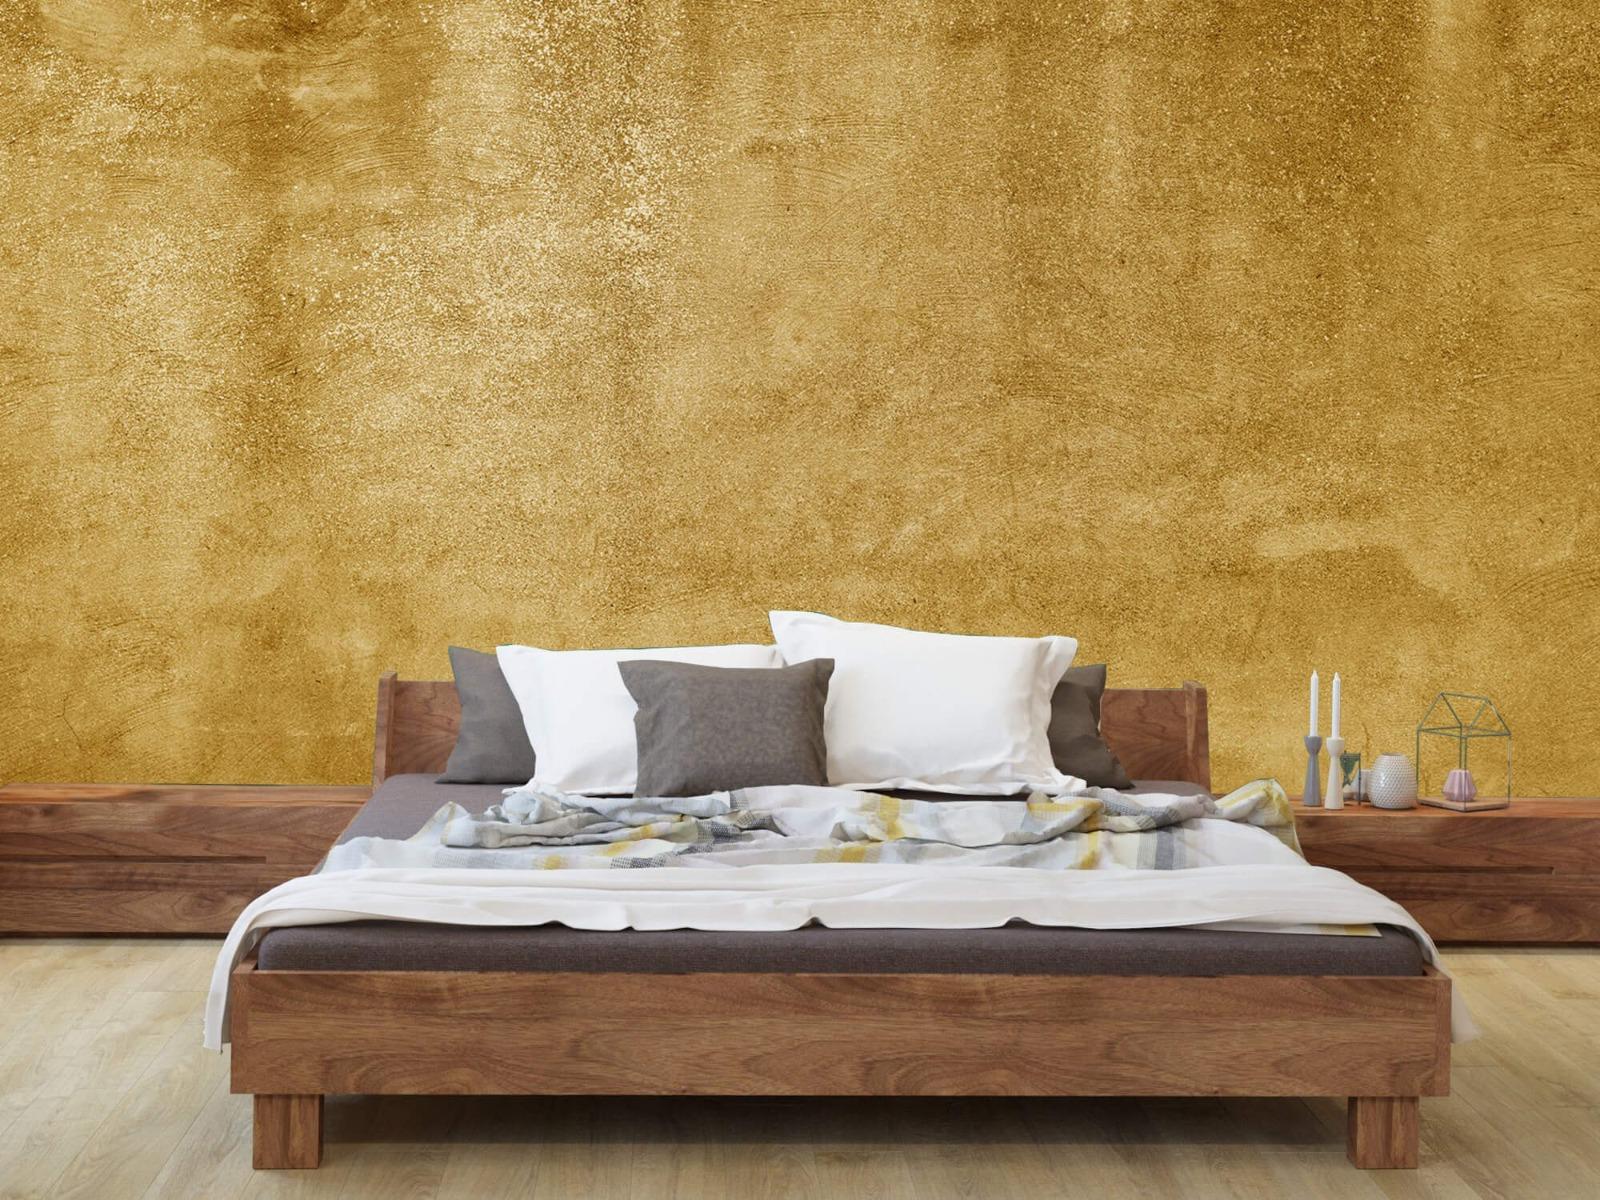 Betonlook behang - Oker geel beton - Woonkamer 8